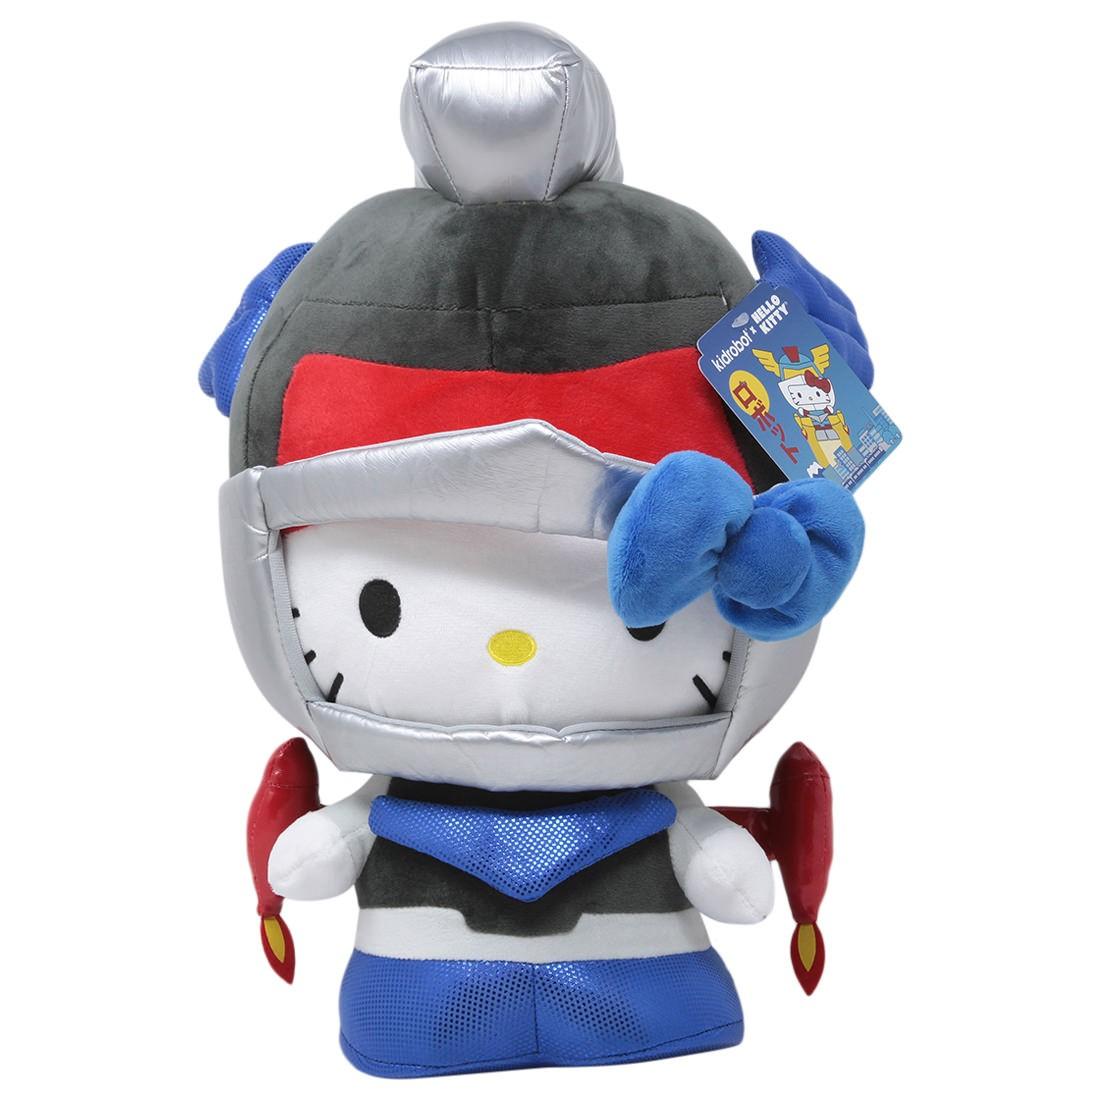 Kidrobot x Sanrio Hello Kitty Cosplay Kaiju Mechazoar Knight Plush (blue)